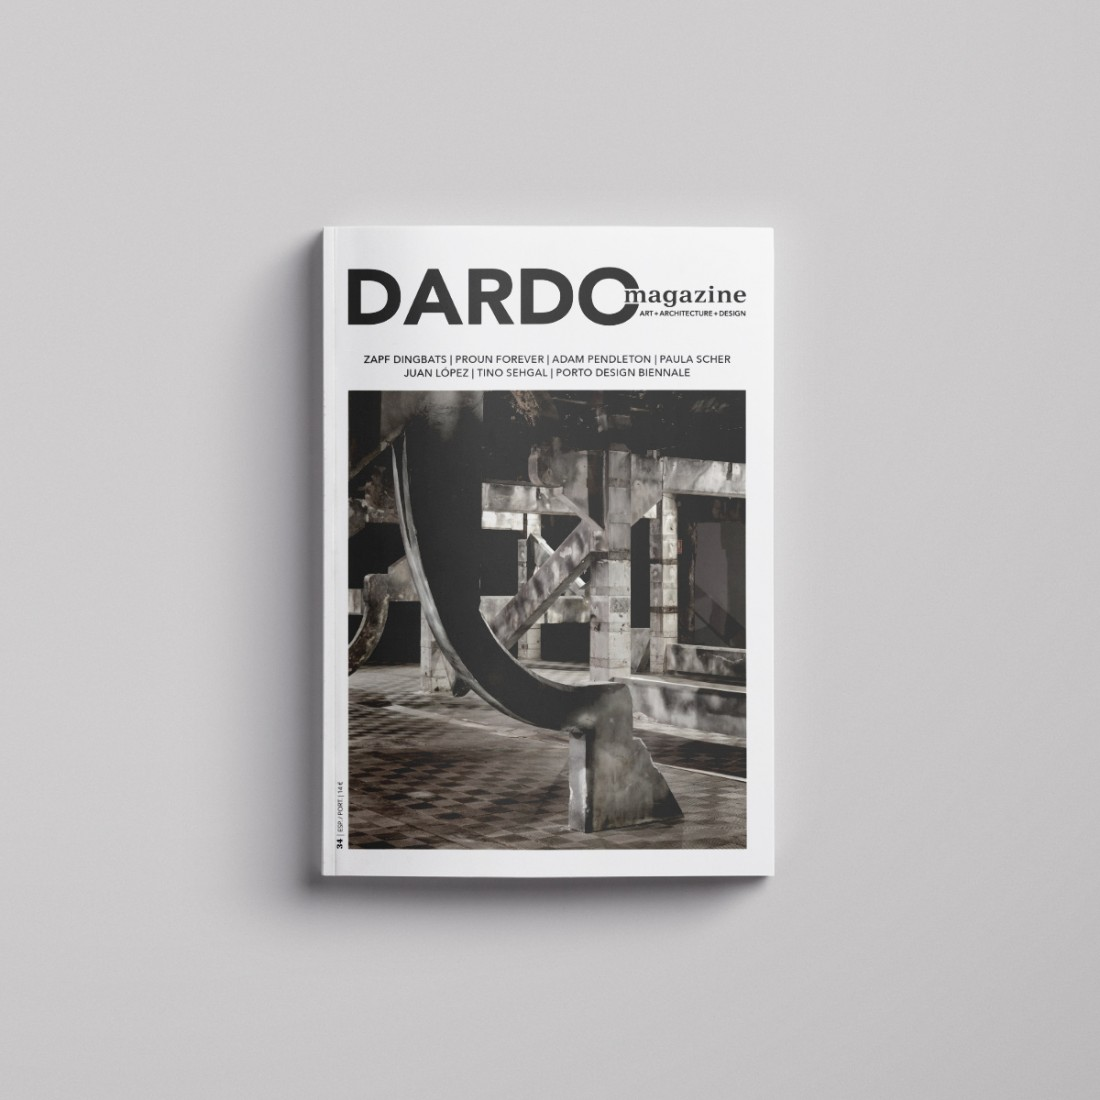 DARDOmagazine 34